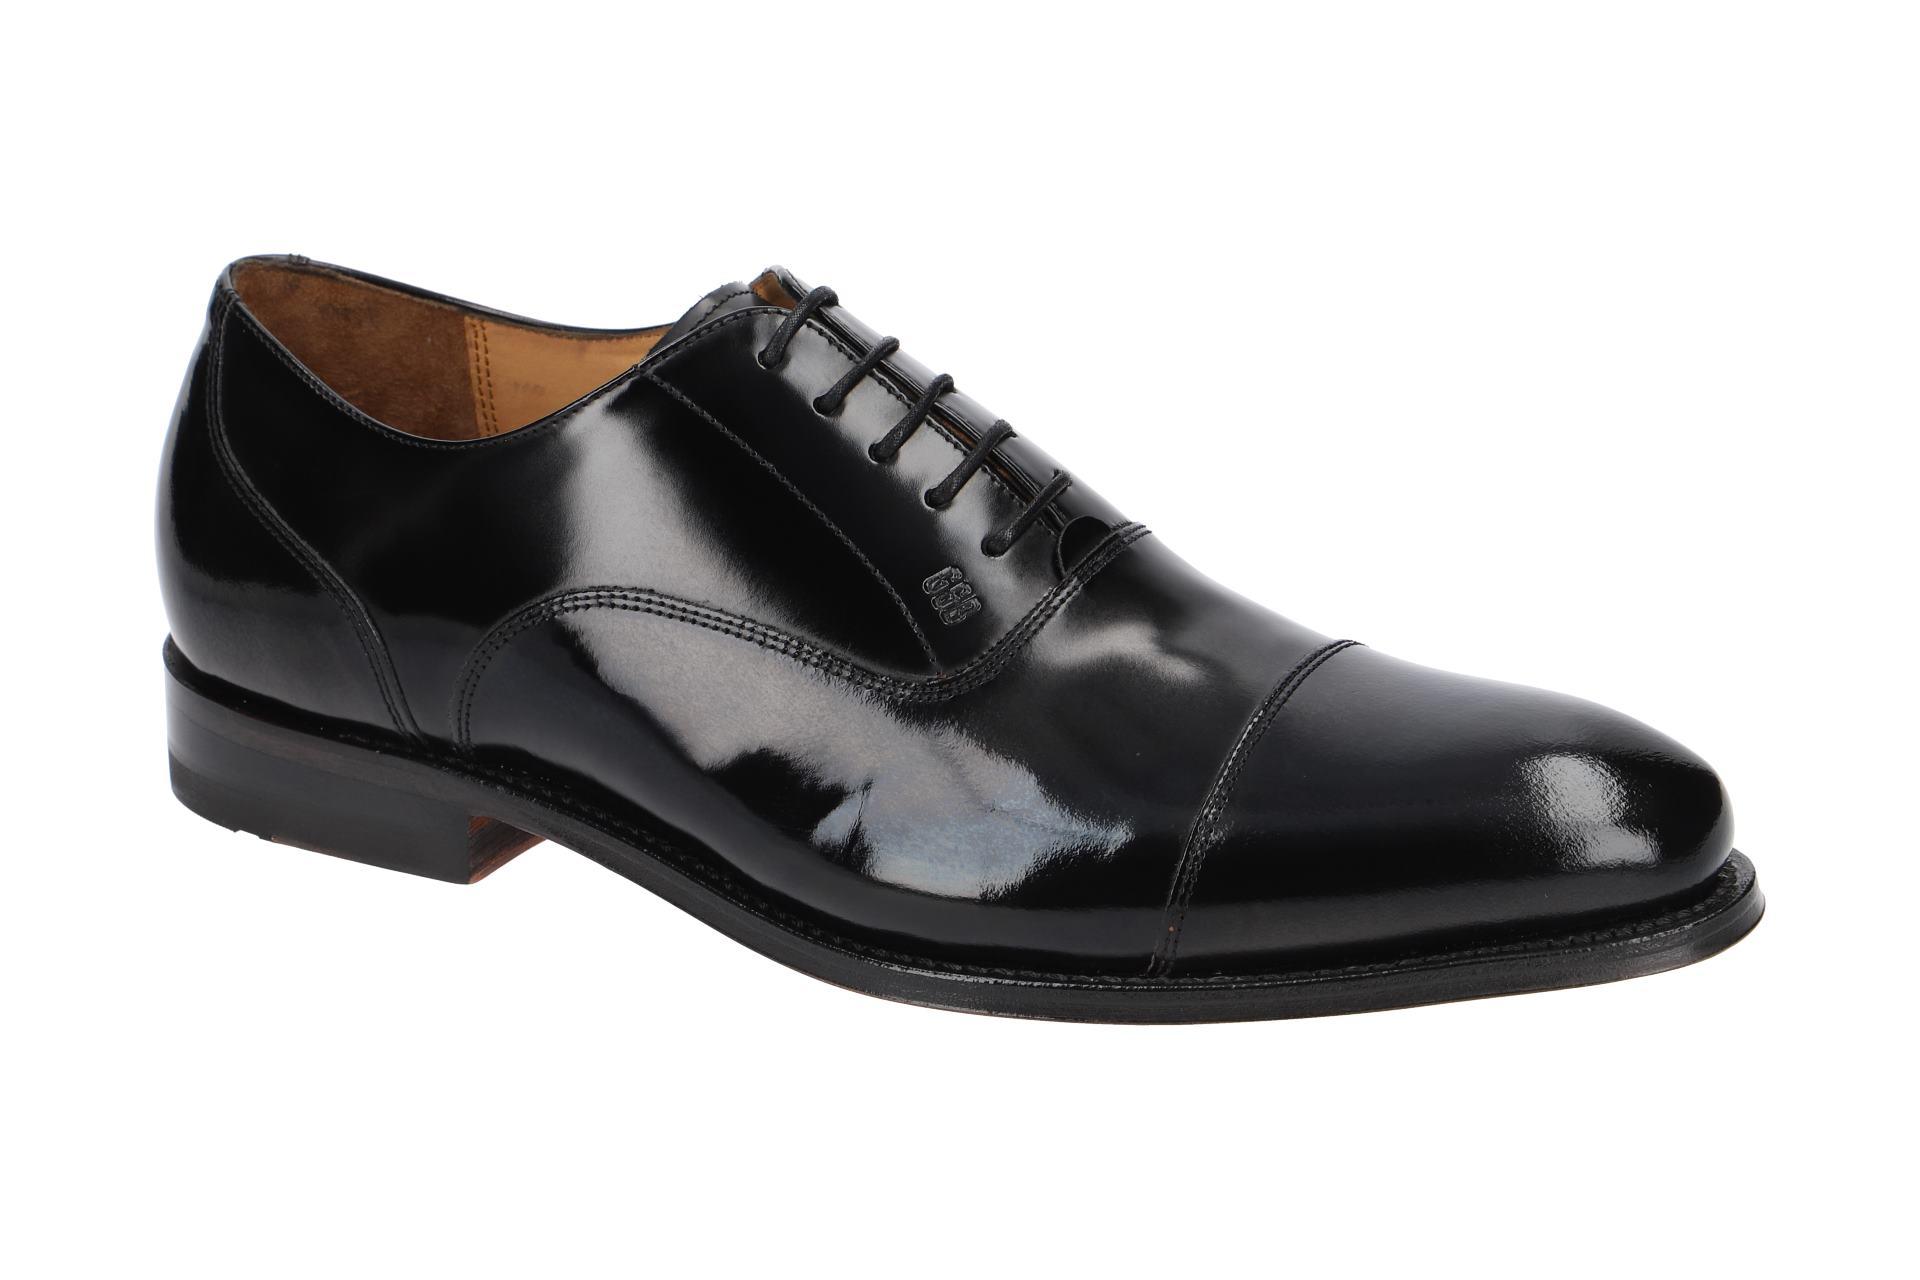 8a8826d0c4bd26 Gordon   Bros Schuhe online kaufen - Businessschuhe